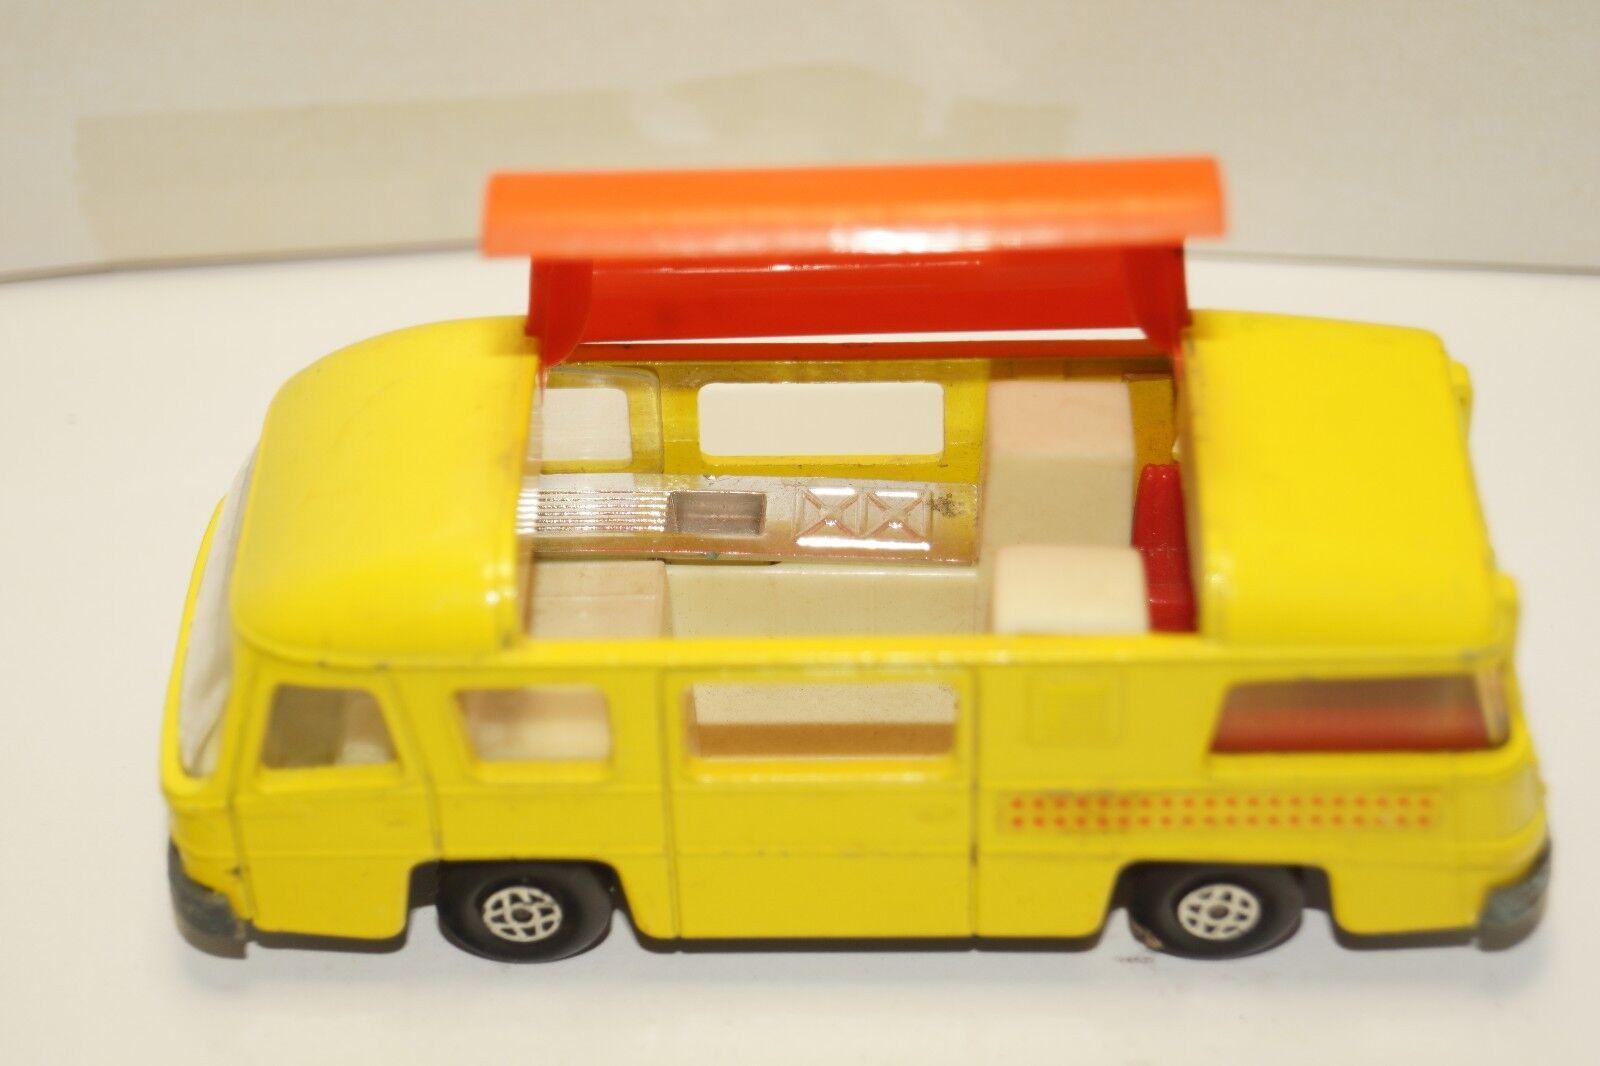 Original matchbox - speed kings - k-27 camping - cruiser - gelb - Orange - dach